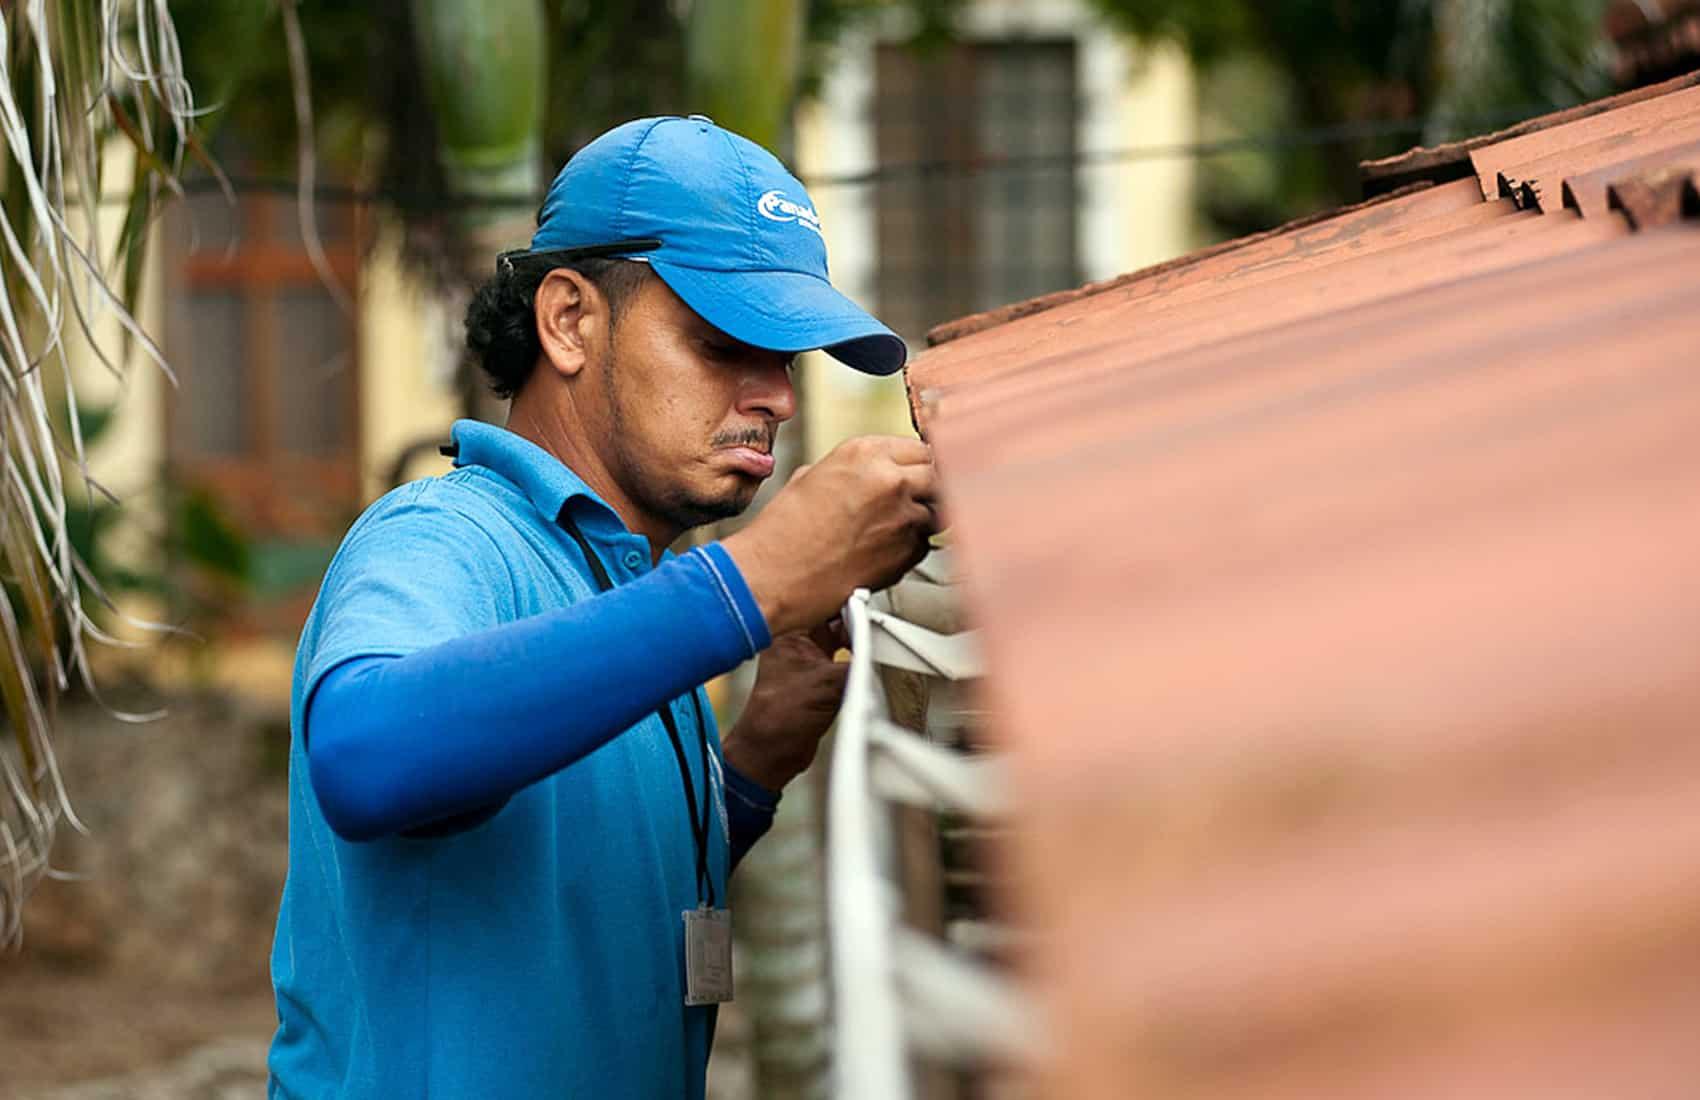 Efforts to control dengue in Costa Rica